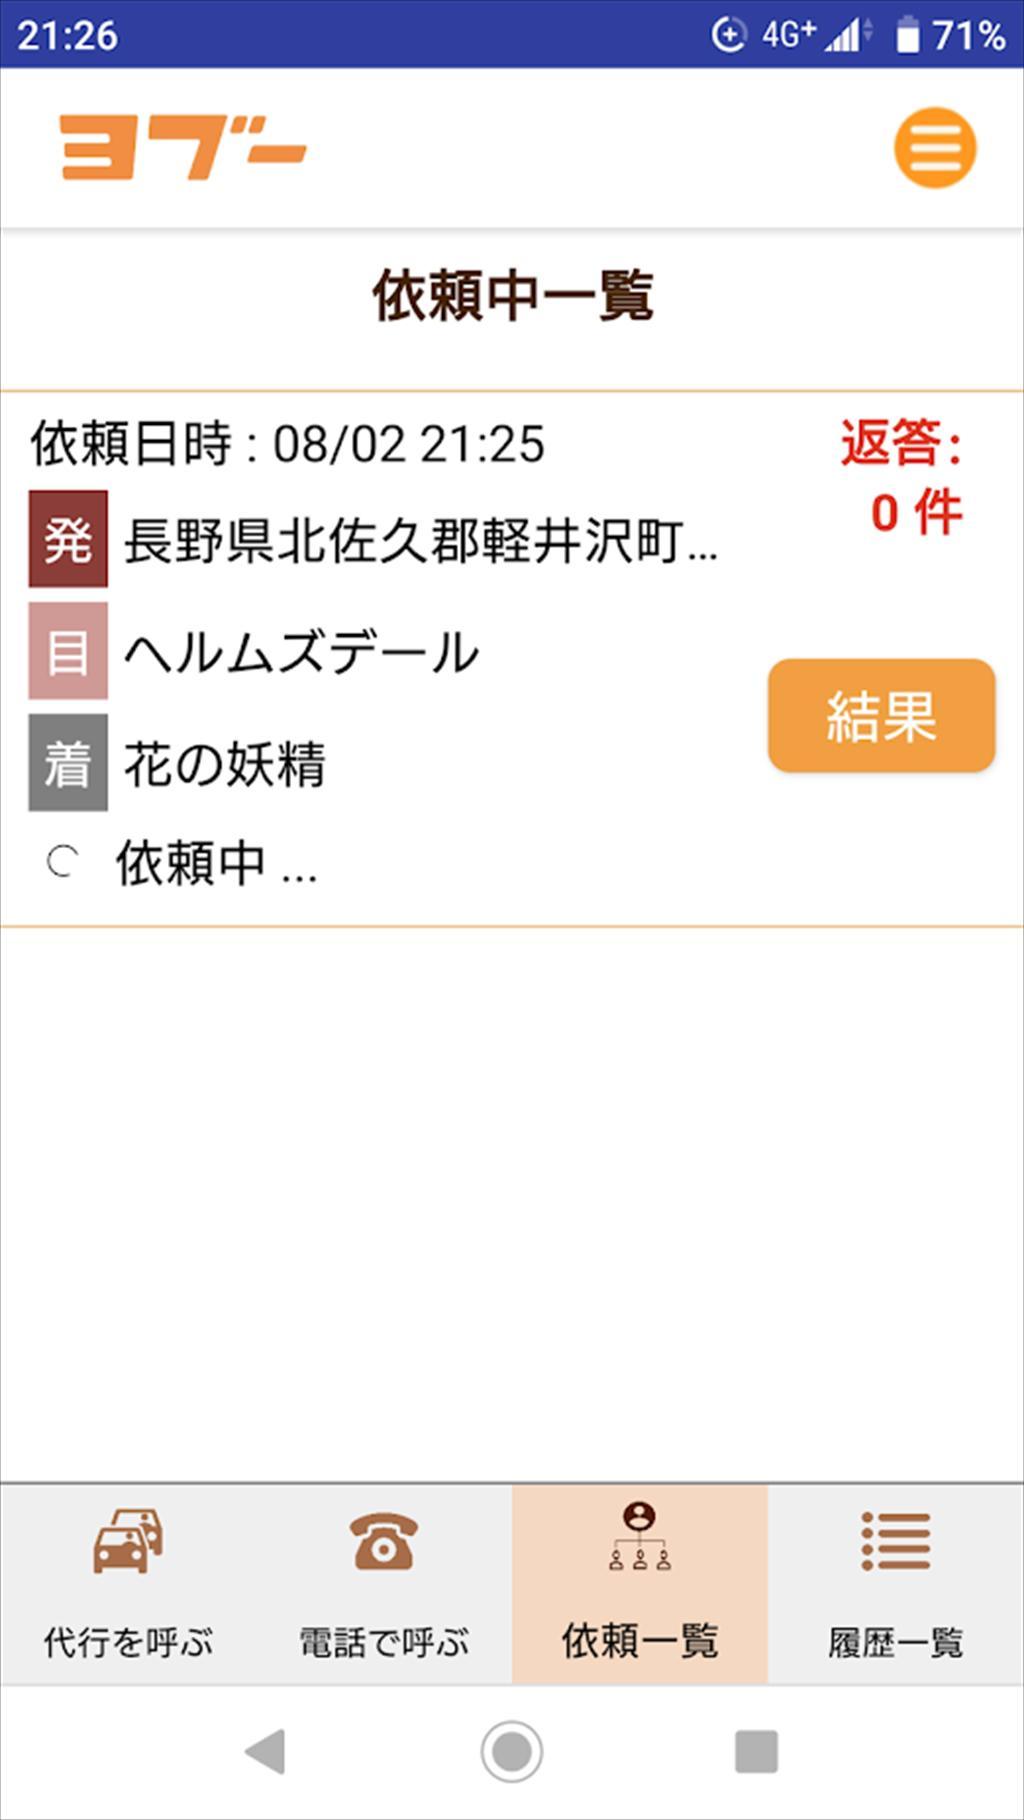 https://hayashida.jp/o/images2019-/Screenshot_20200802-212700_R.JPG